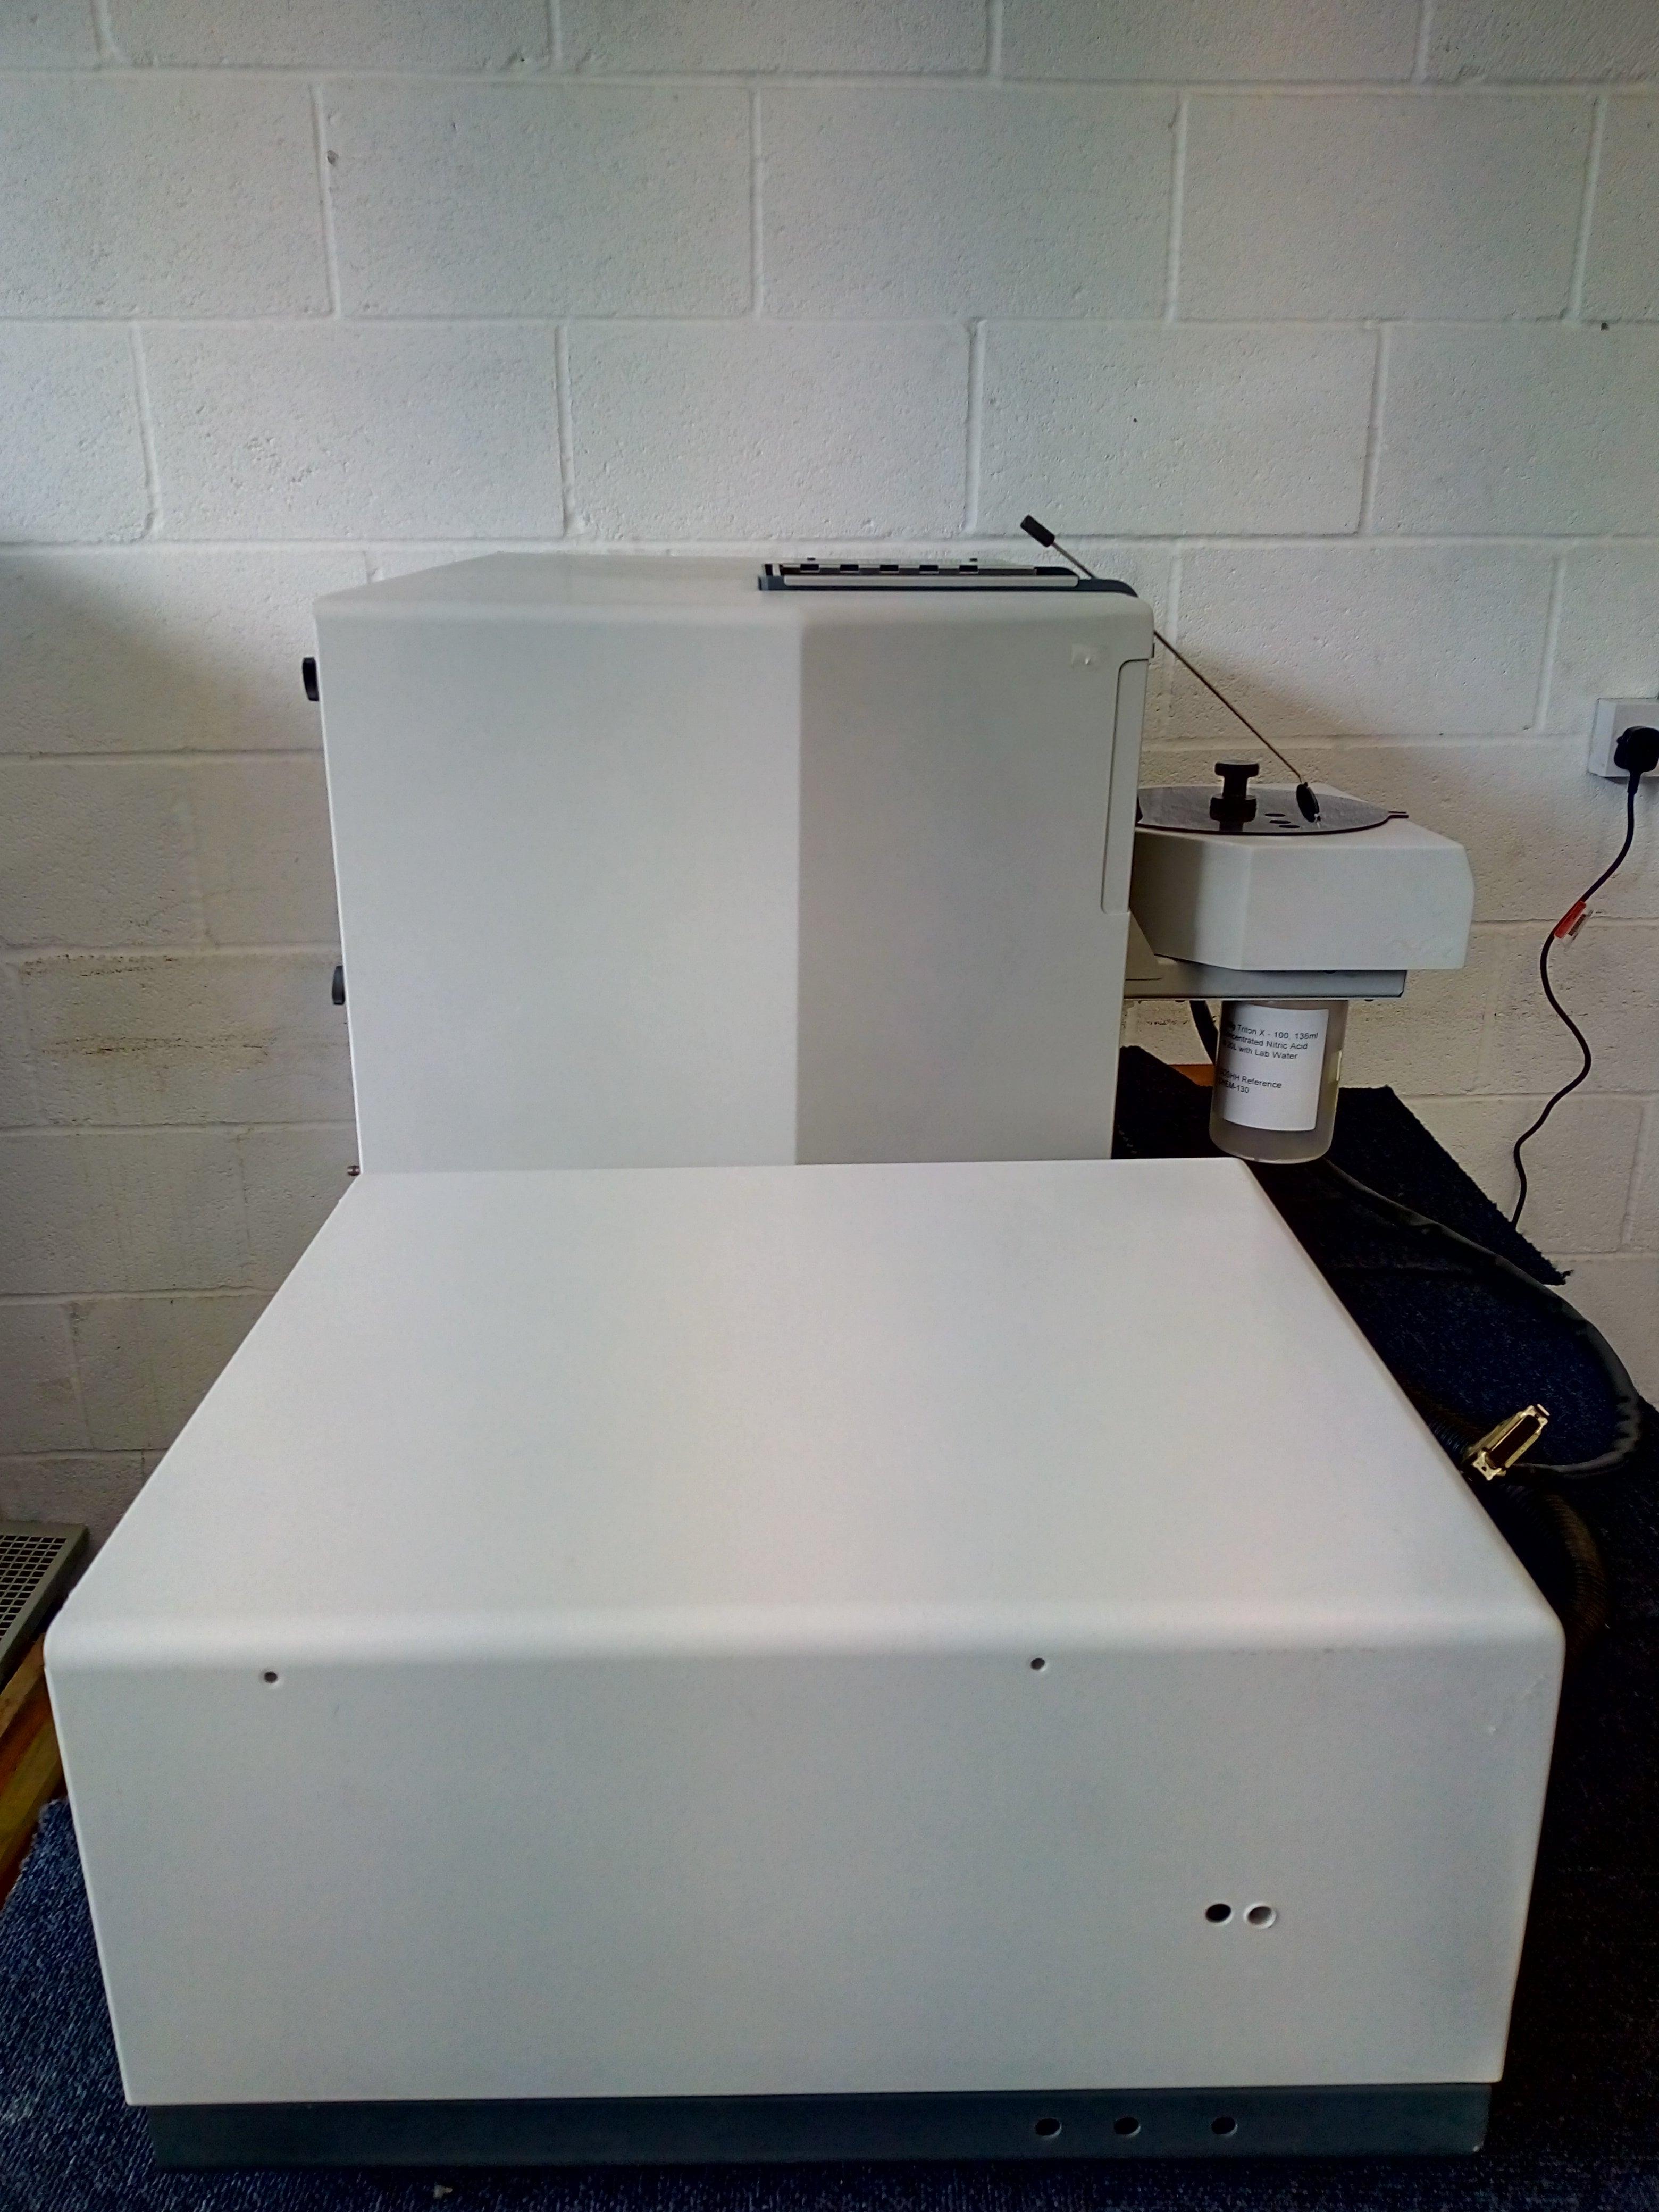 Varian spectraa 220 atomic absorption spectrometer manual